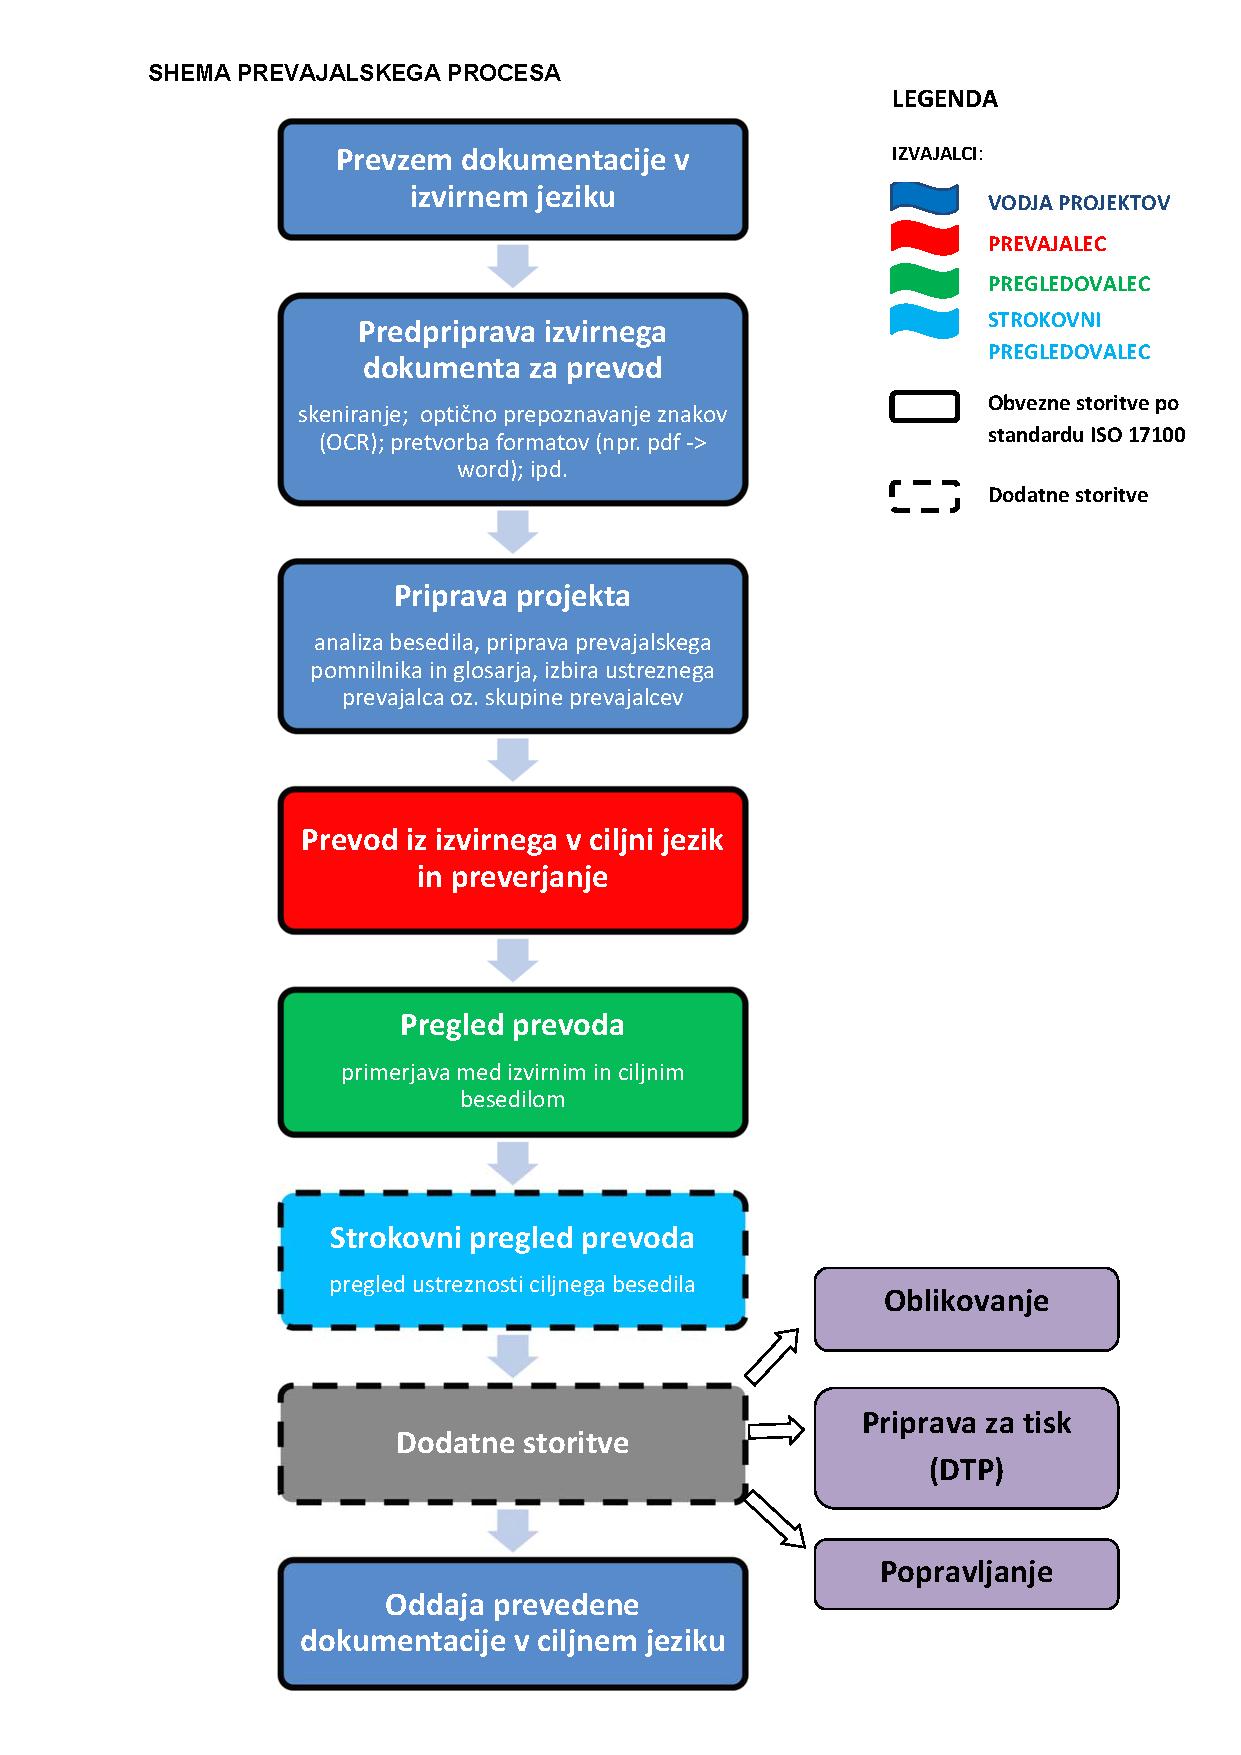 prevajalski proces_osnutek sheme2